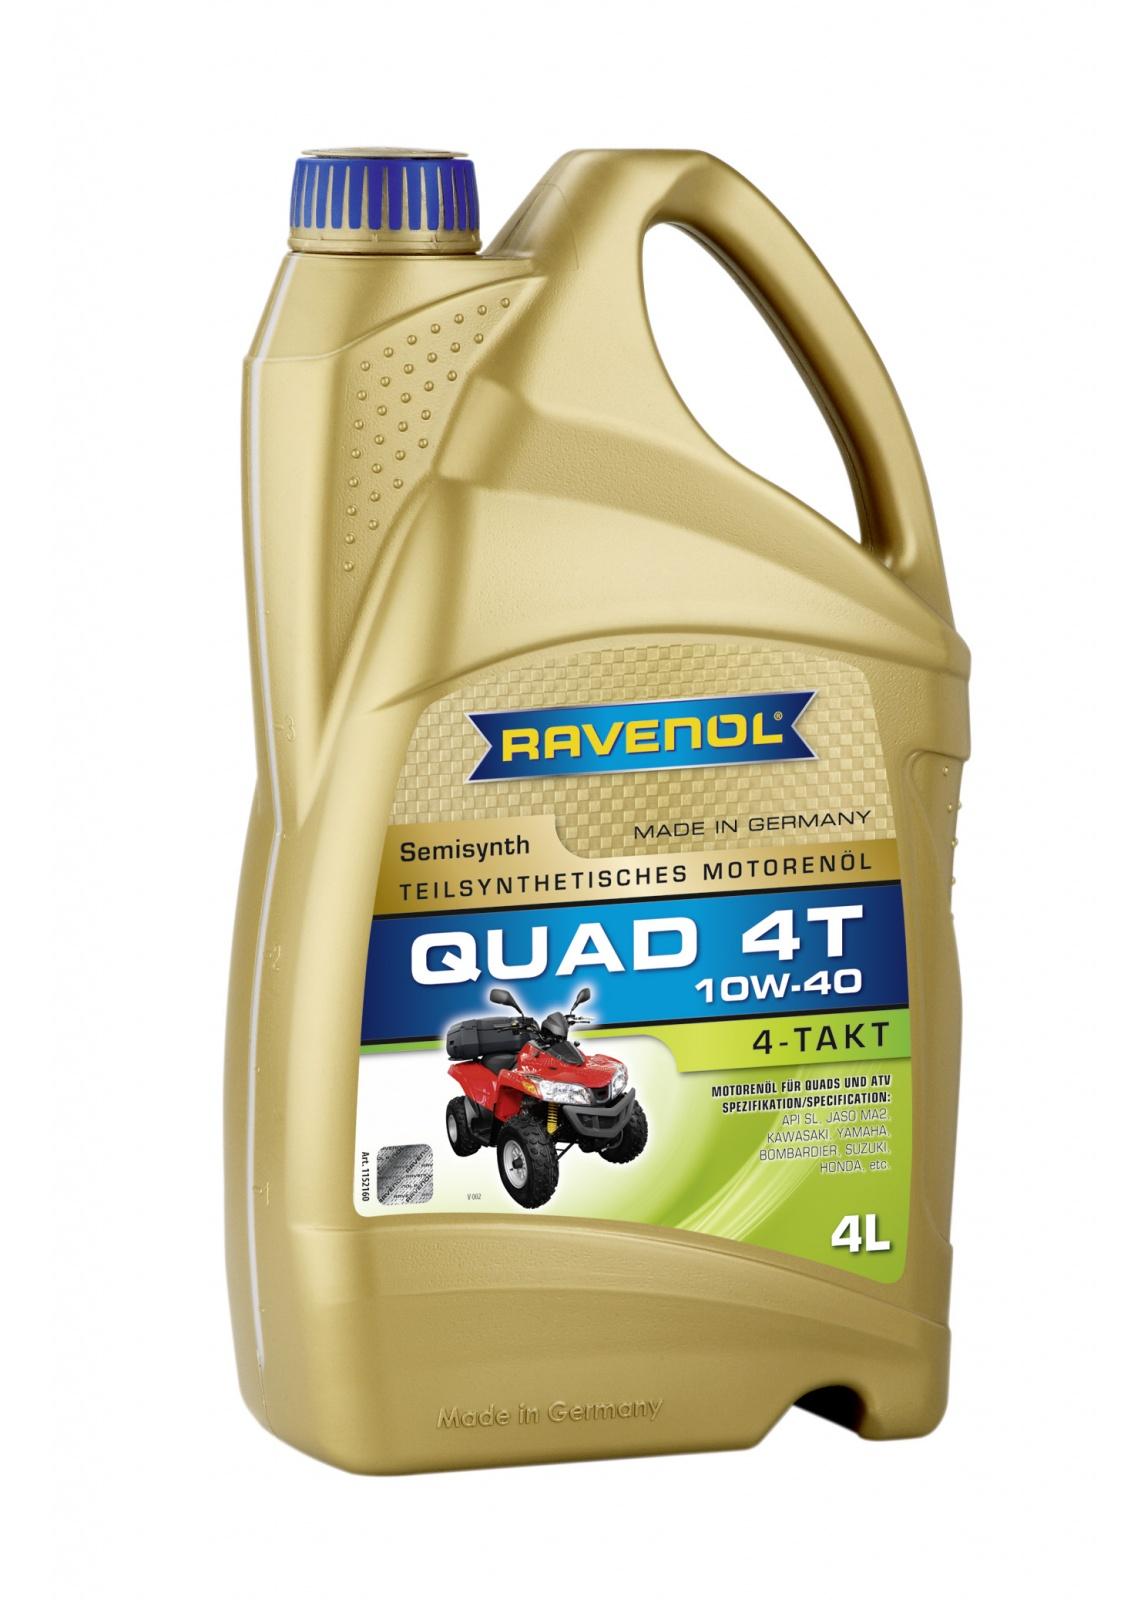 RAVENOL QUAD 4T 10W-40 Engine Oil